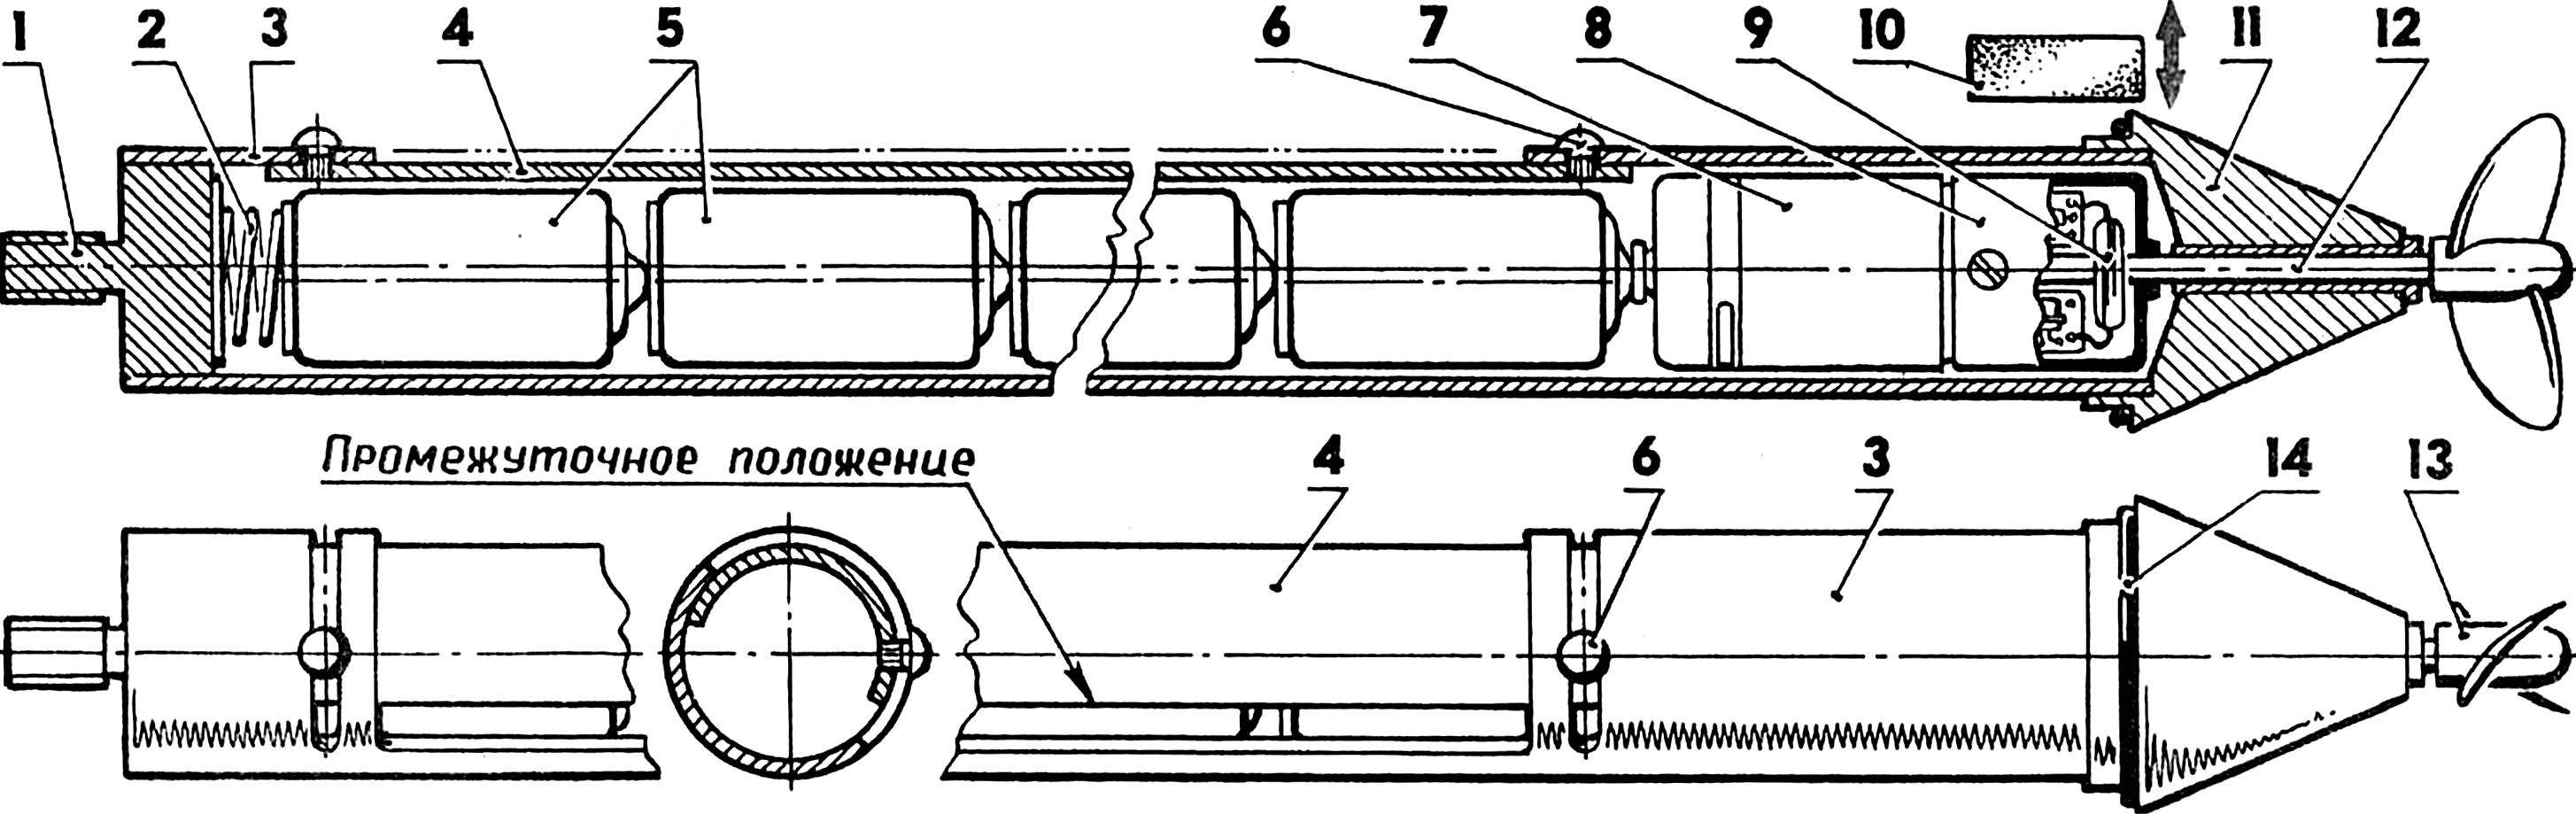 Рис. 1. Схема универсального модульного моноблока.